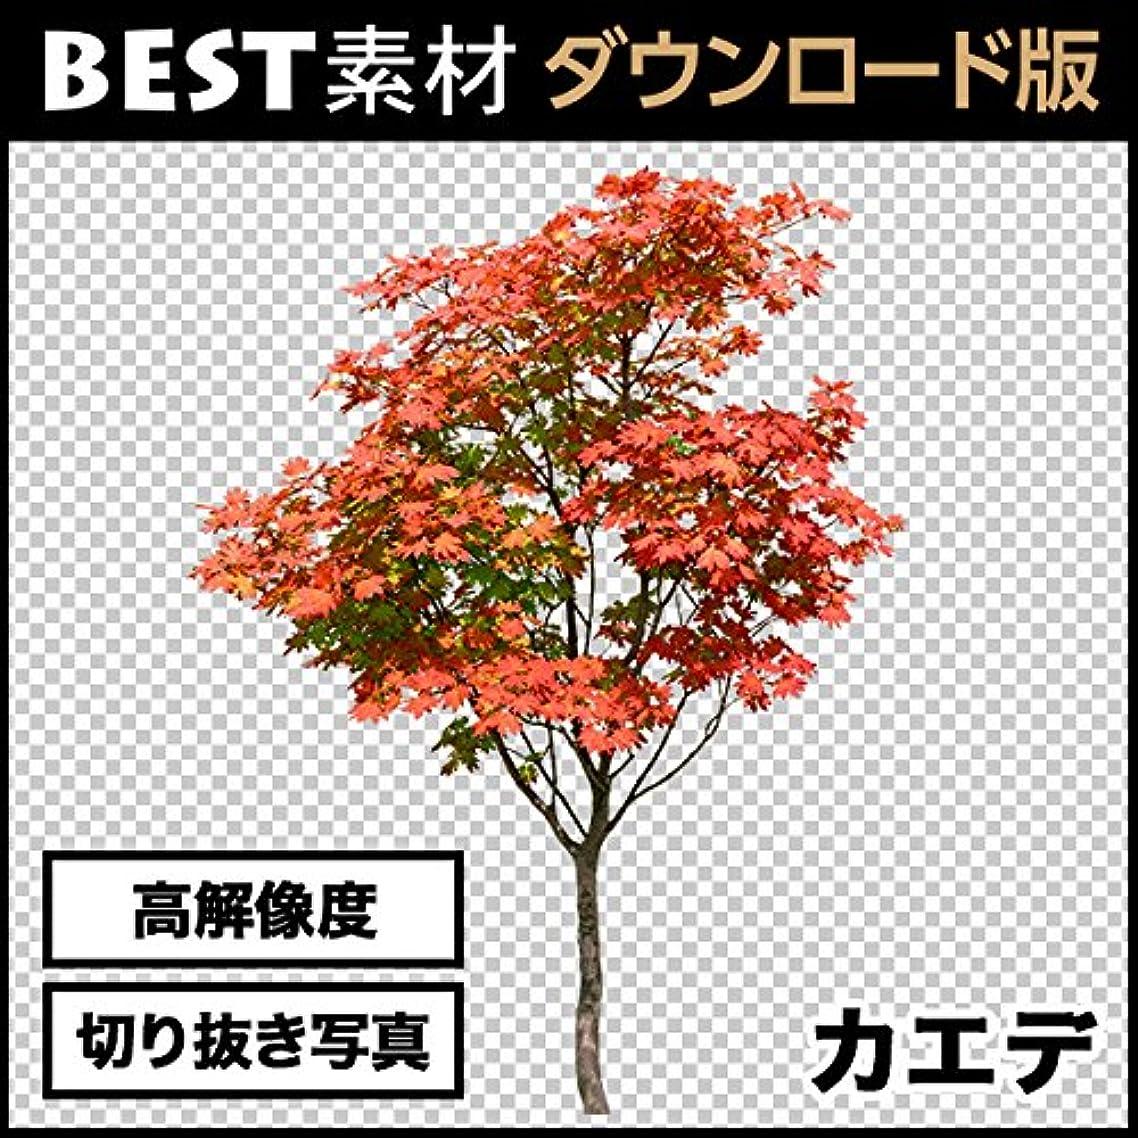 【BEST素材】高解像度の切り抜き写真_カエデ01 [ダウンロード]